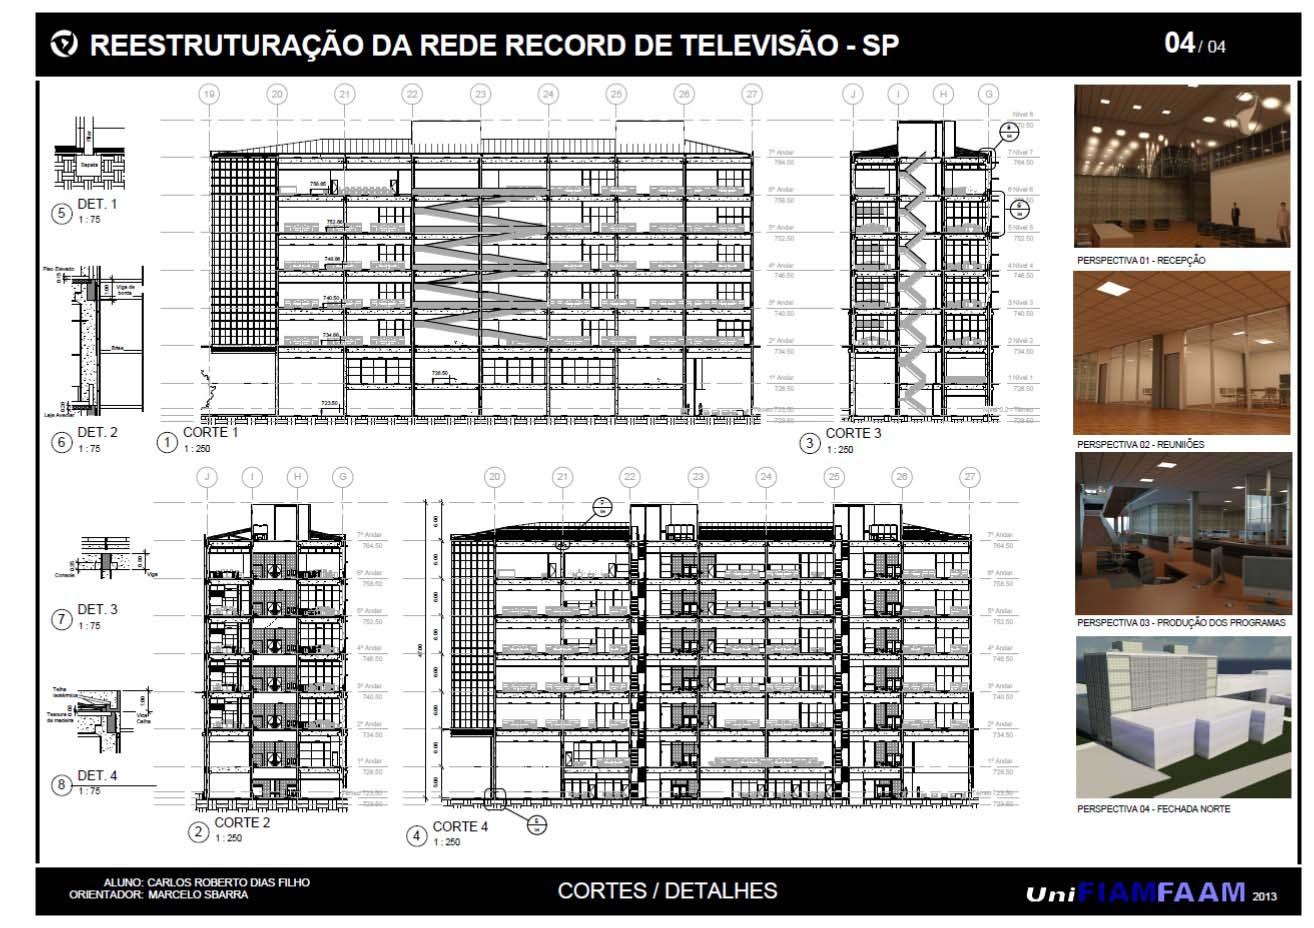 Rede Record - Prancha 04